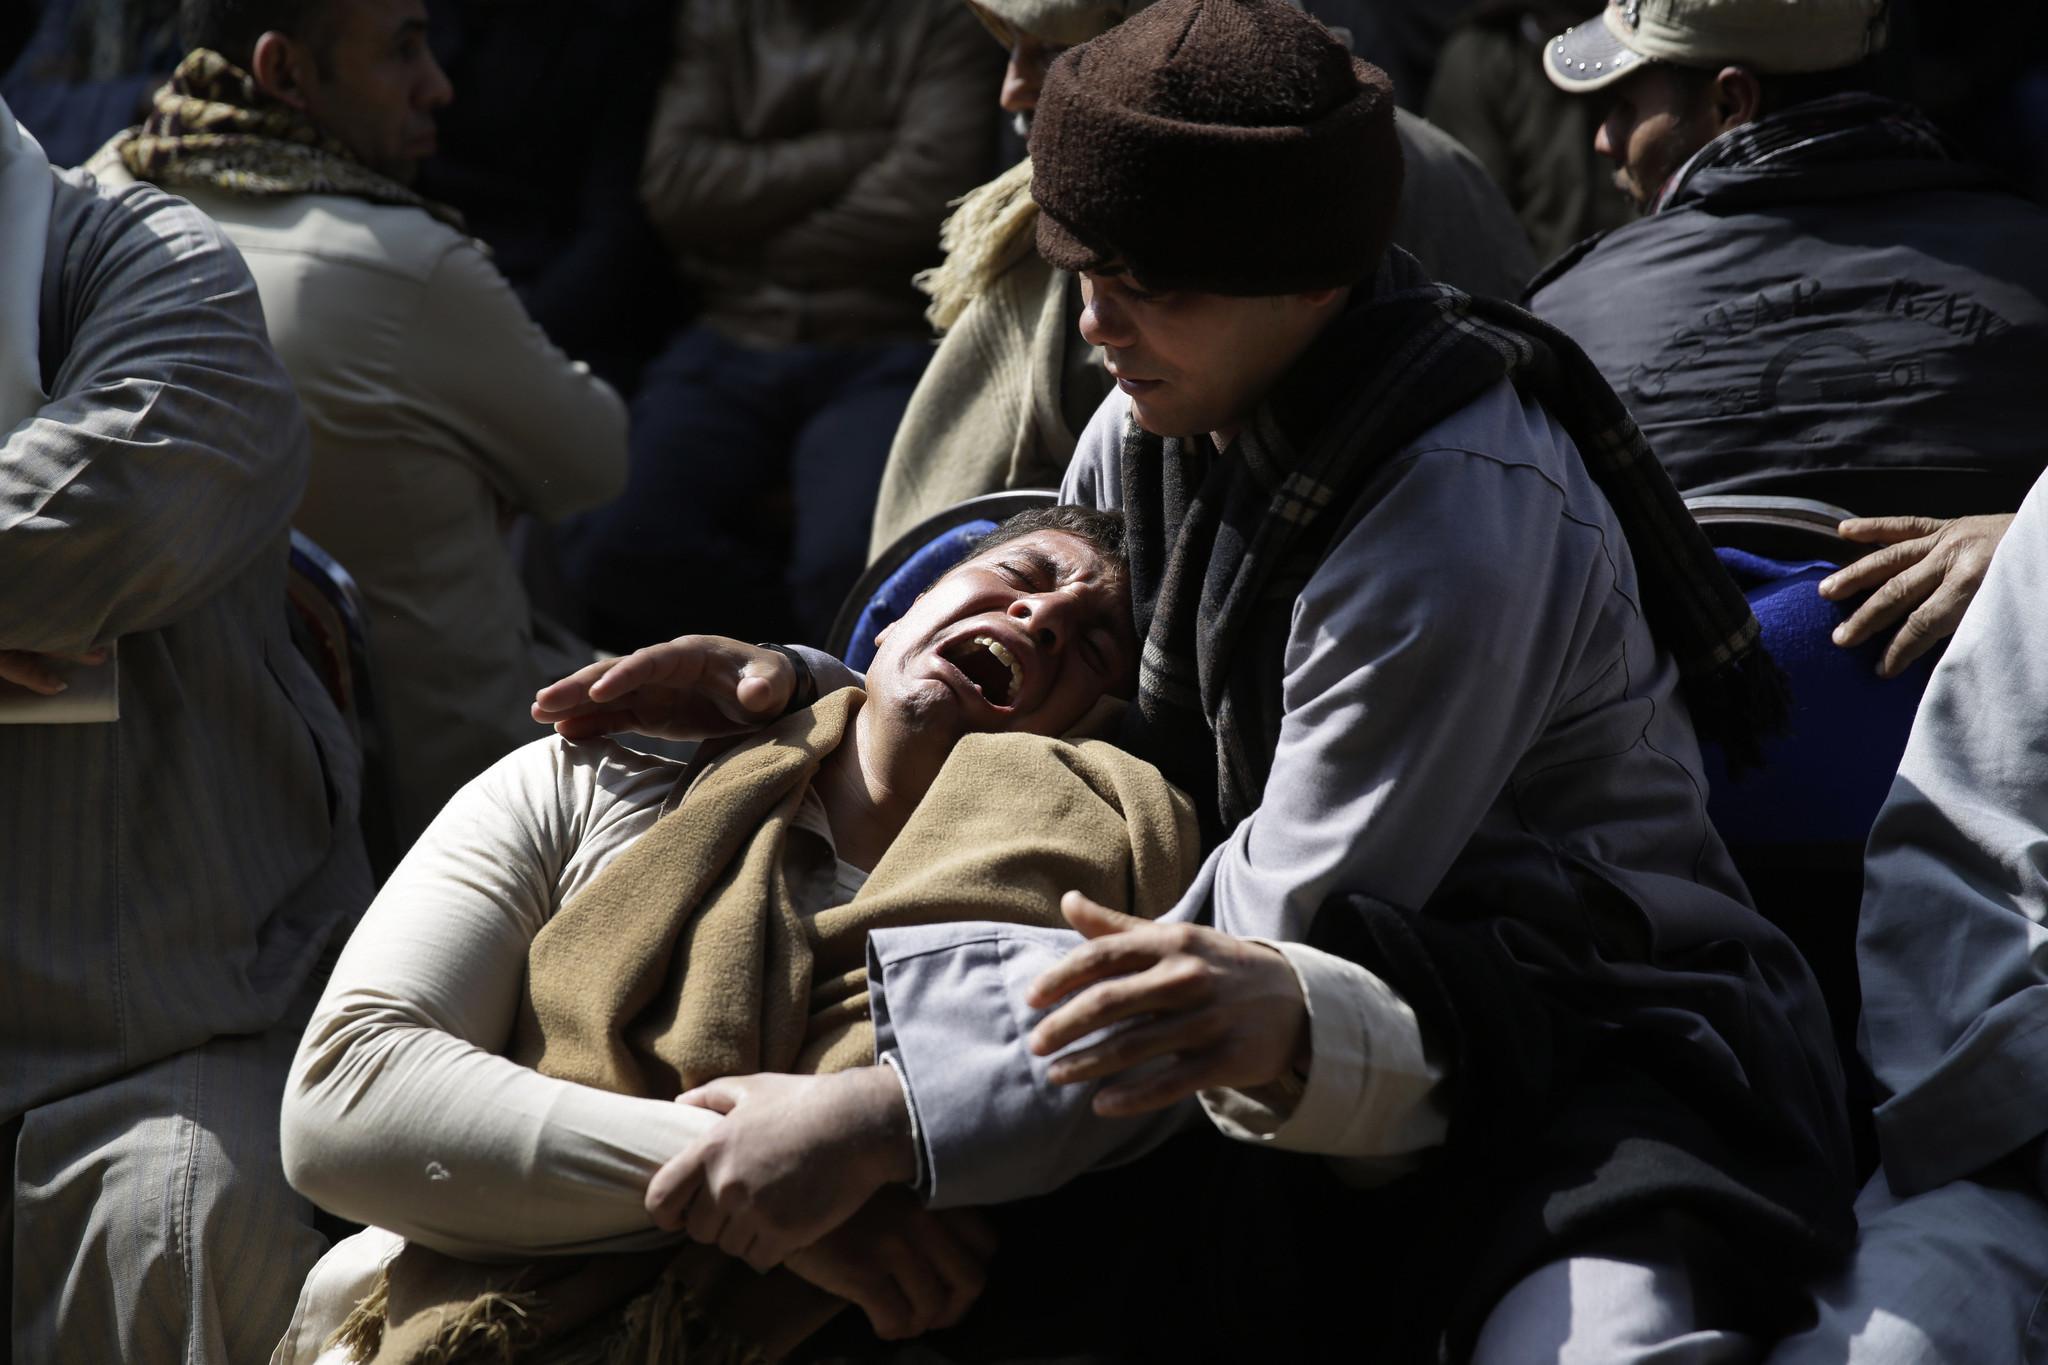 Egypt warplanes strike Islamic State targets after hostage massacre